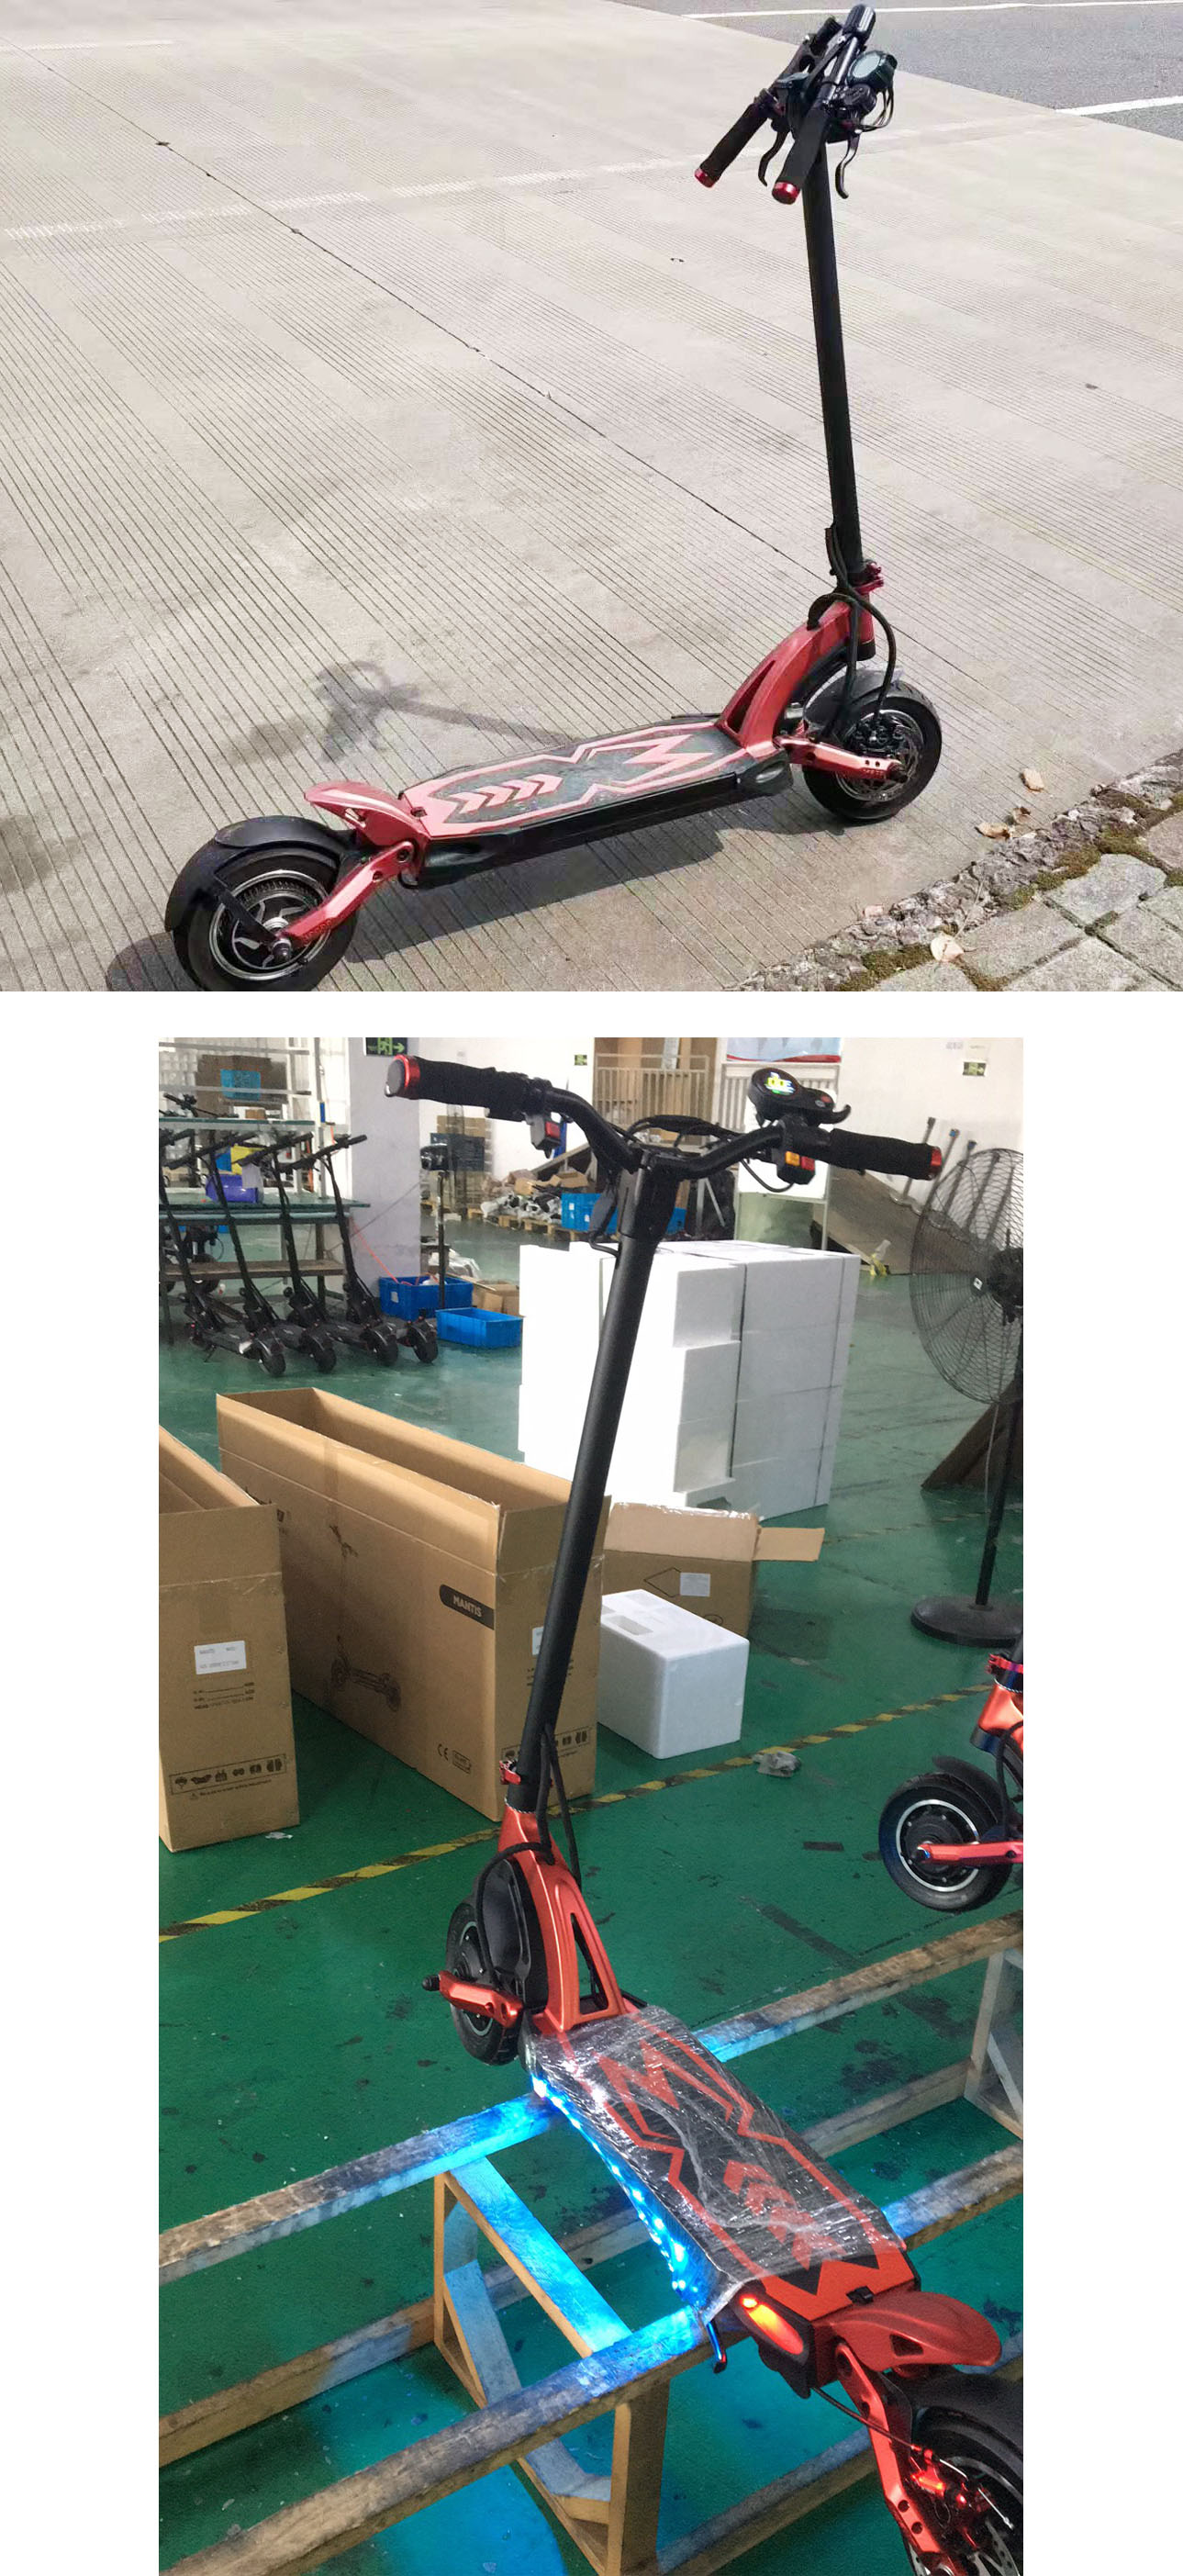 Original Kaabo Mantis 60 V 17.5ah แบตเตอรี่ลิเธียมพับได้ MINI ไฟฟ้า BIKE Scooter